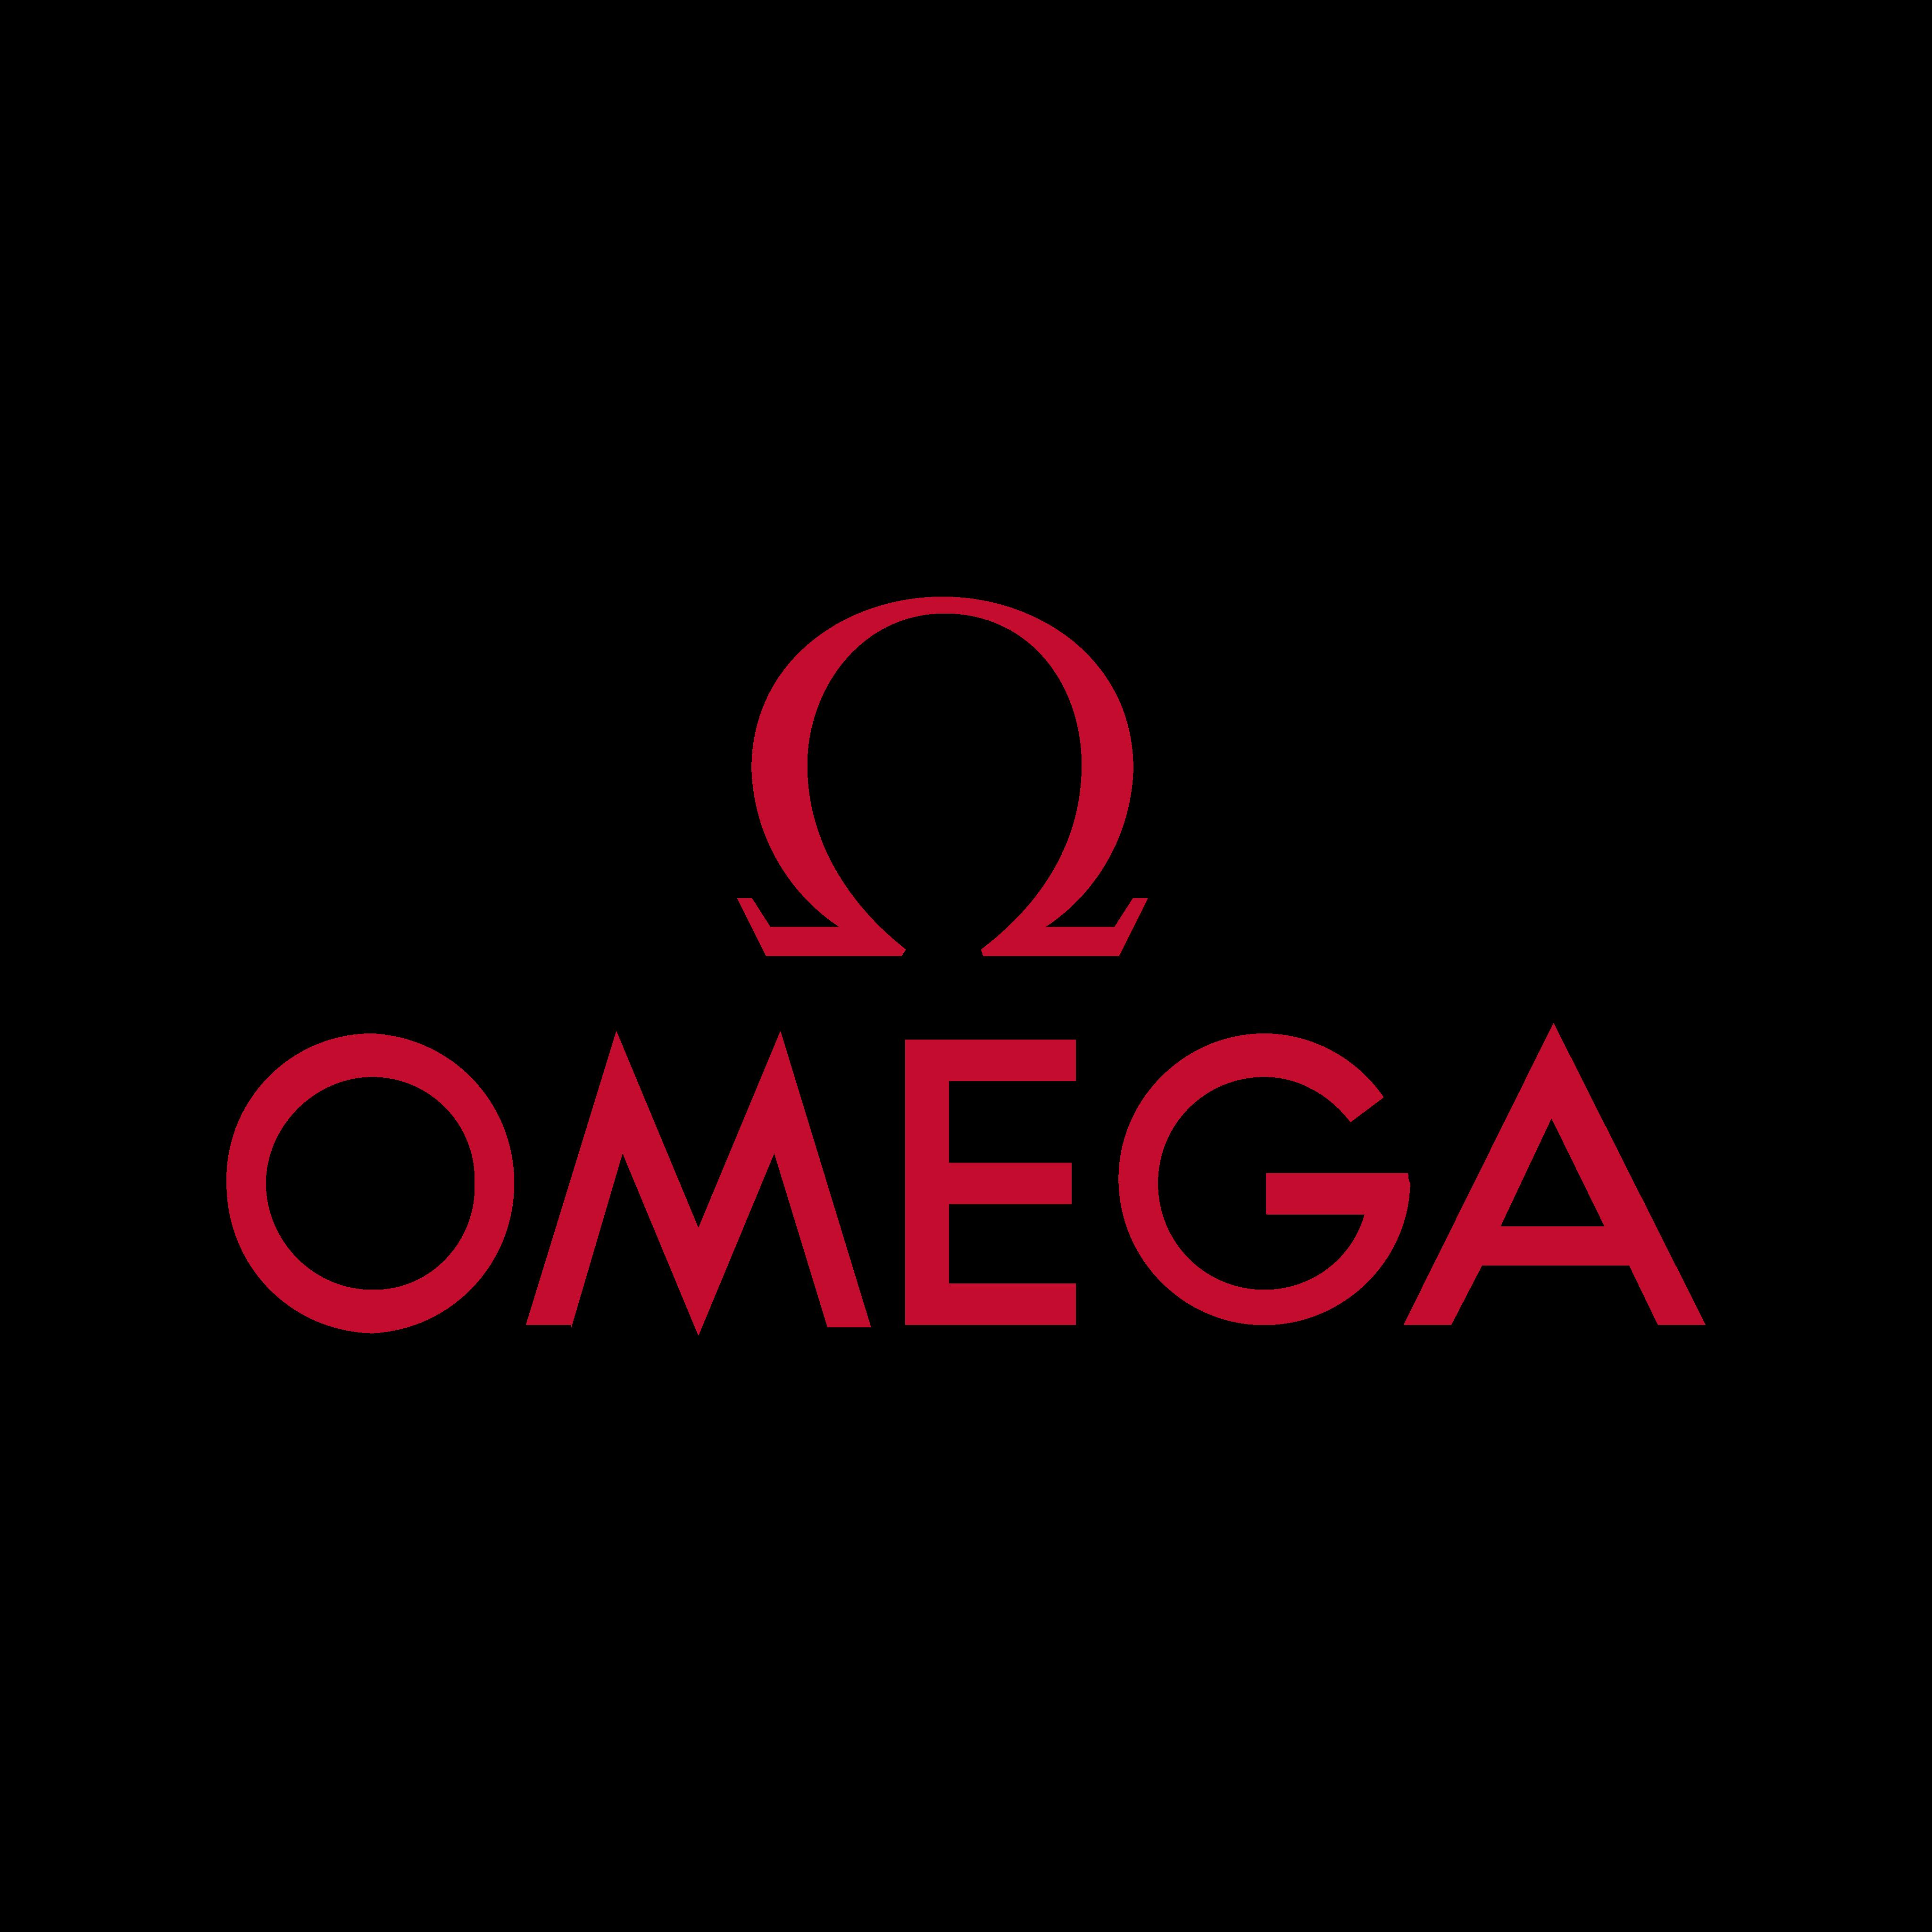 omega logo 0 - Omega Logo